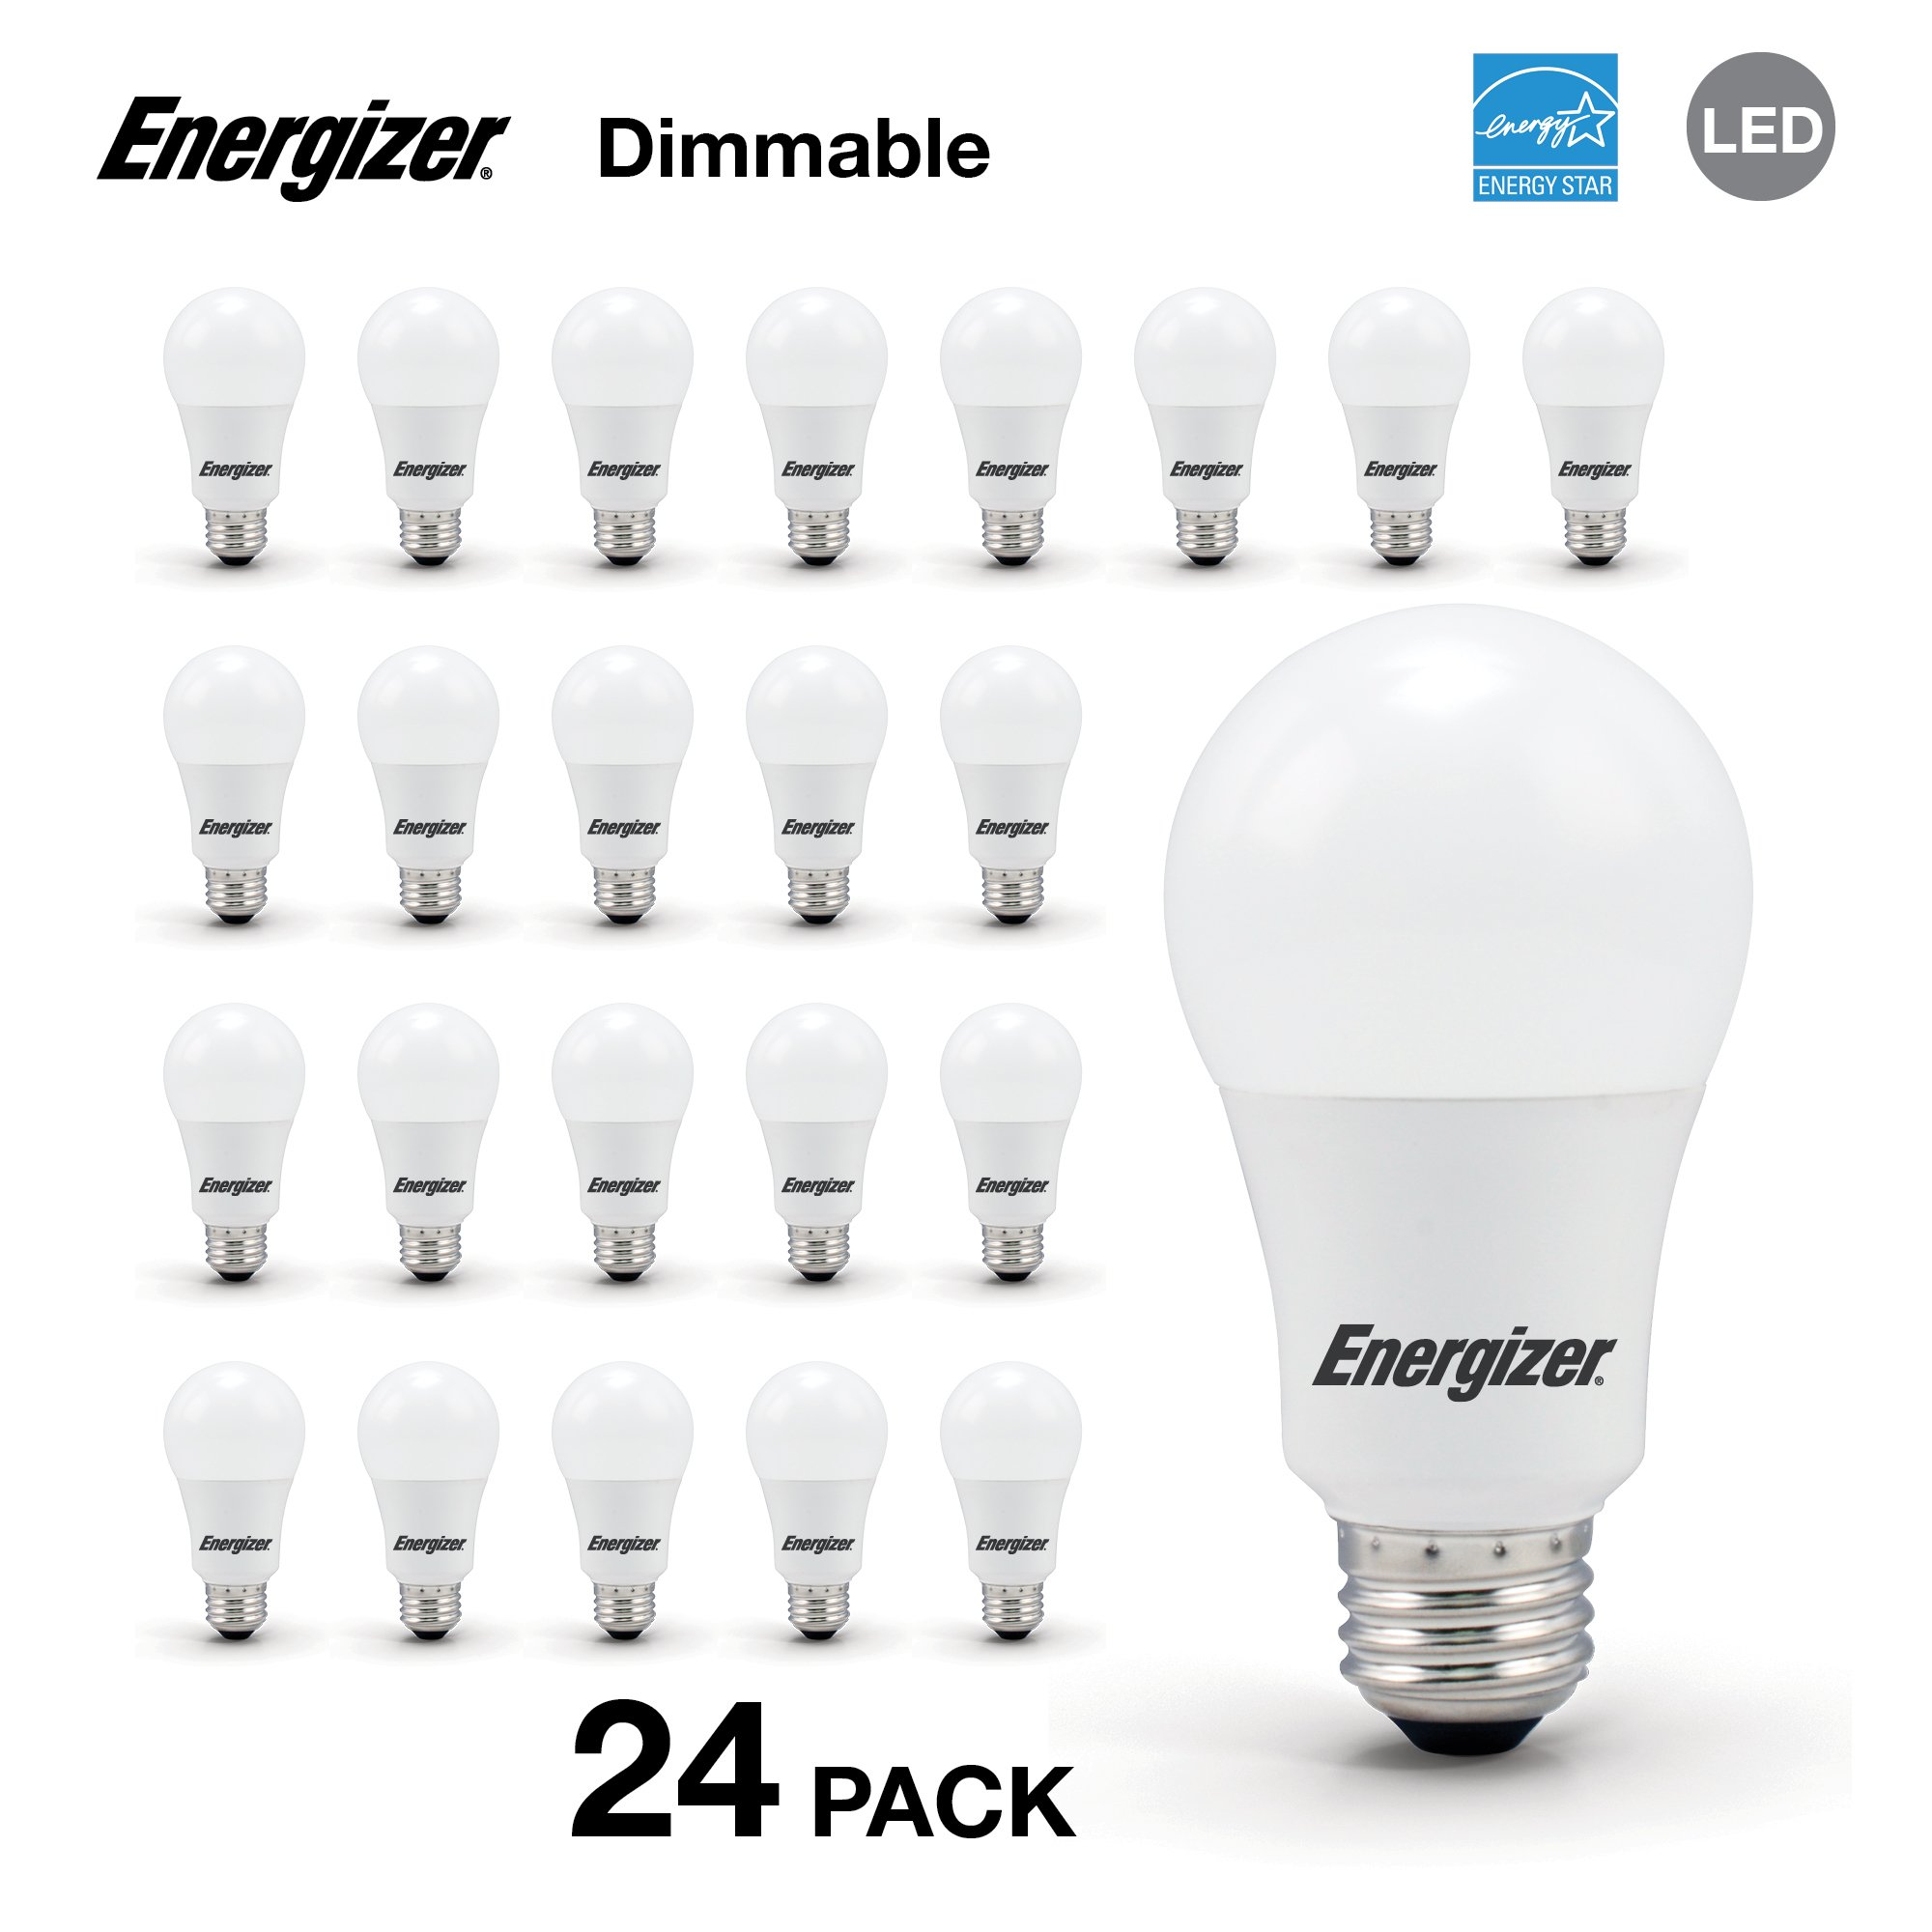 Energizer A19 60 Watt Equivalent Energy Star LED Light Bulb (Dimmable), 24-Pack, Soft White